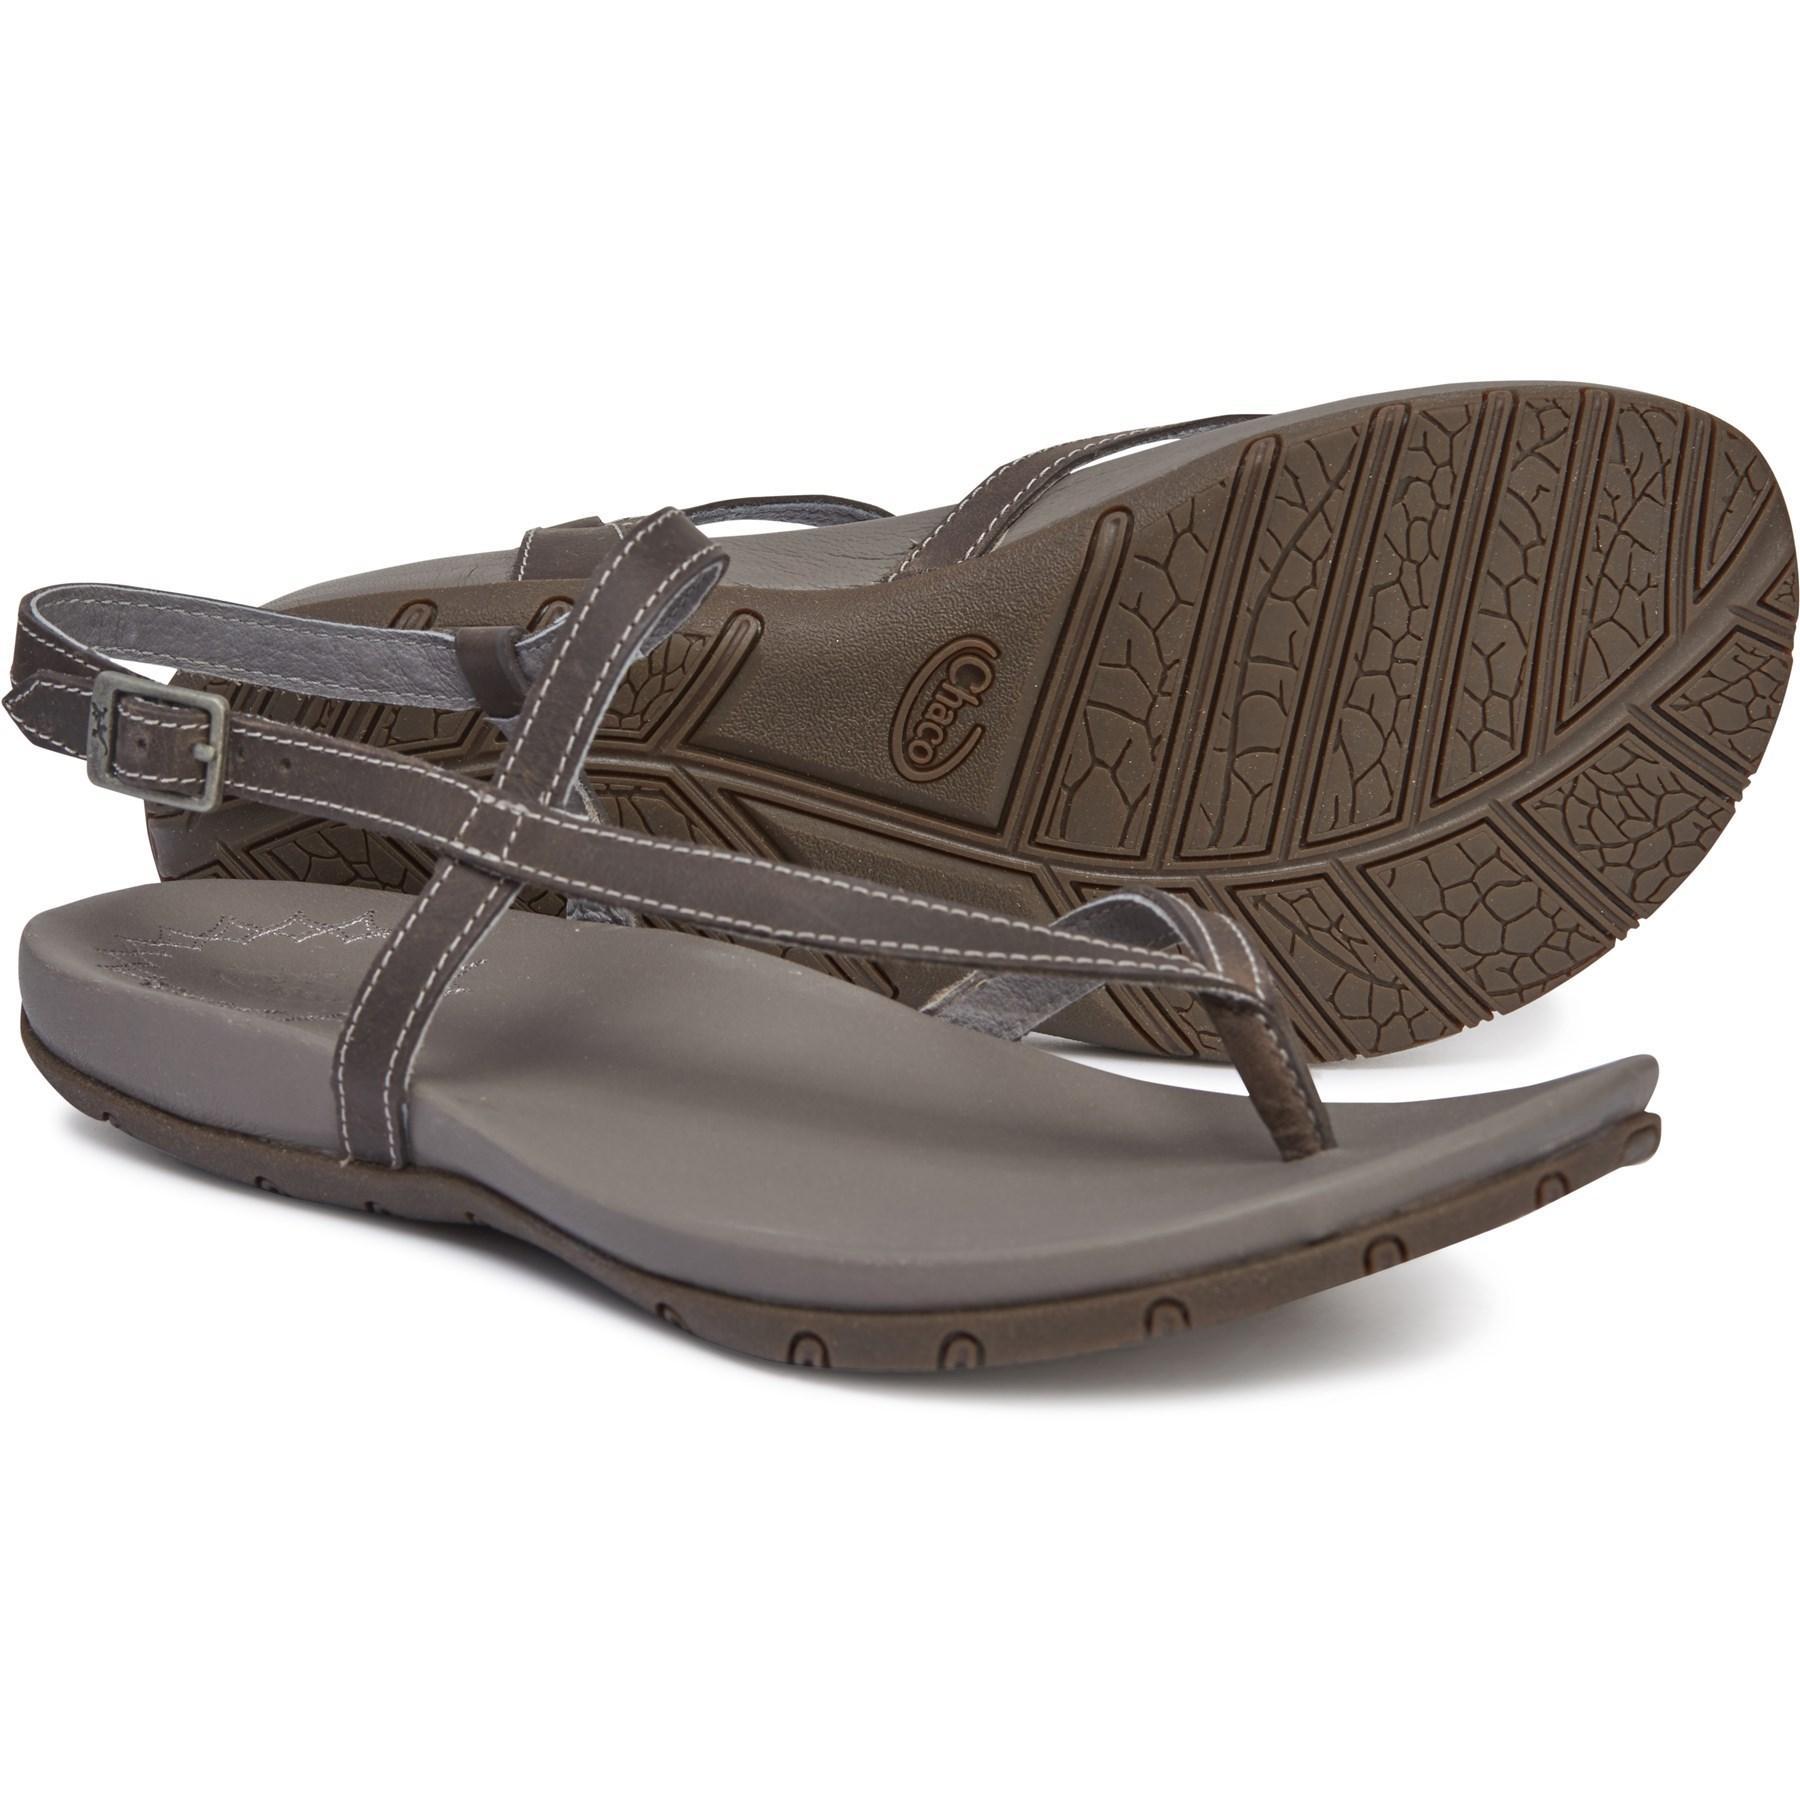 55c32f0a5f30 Lyst - Chaco Rowan Sandals in Gray